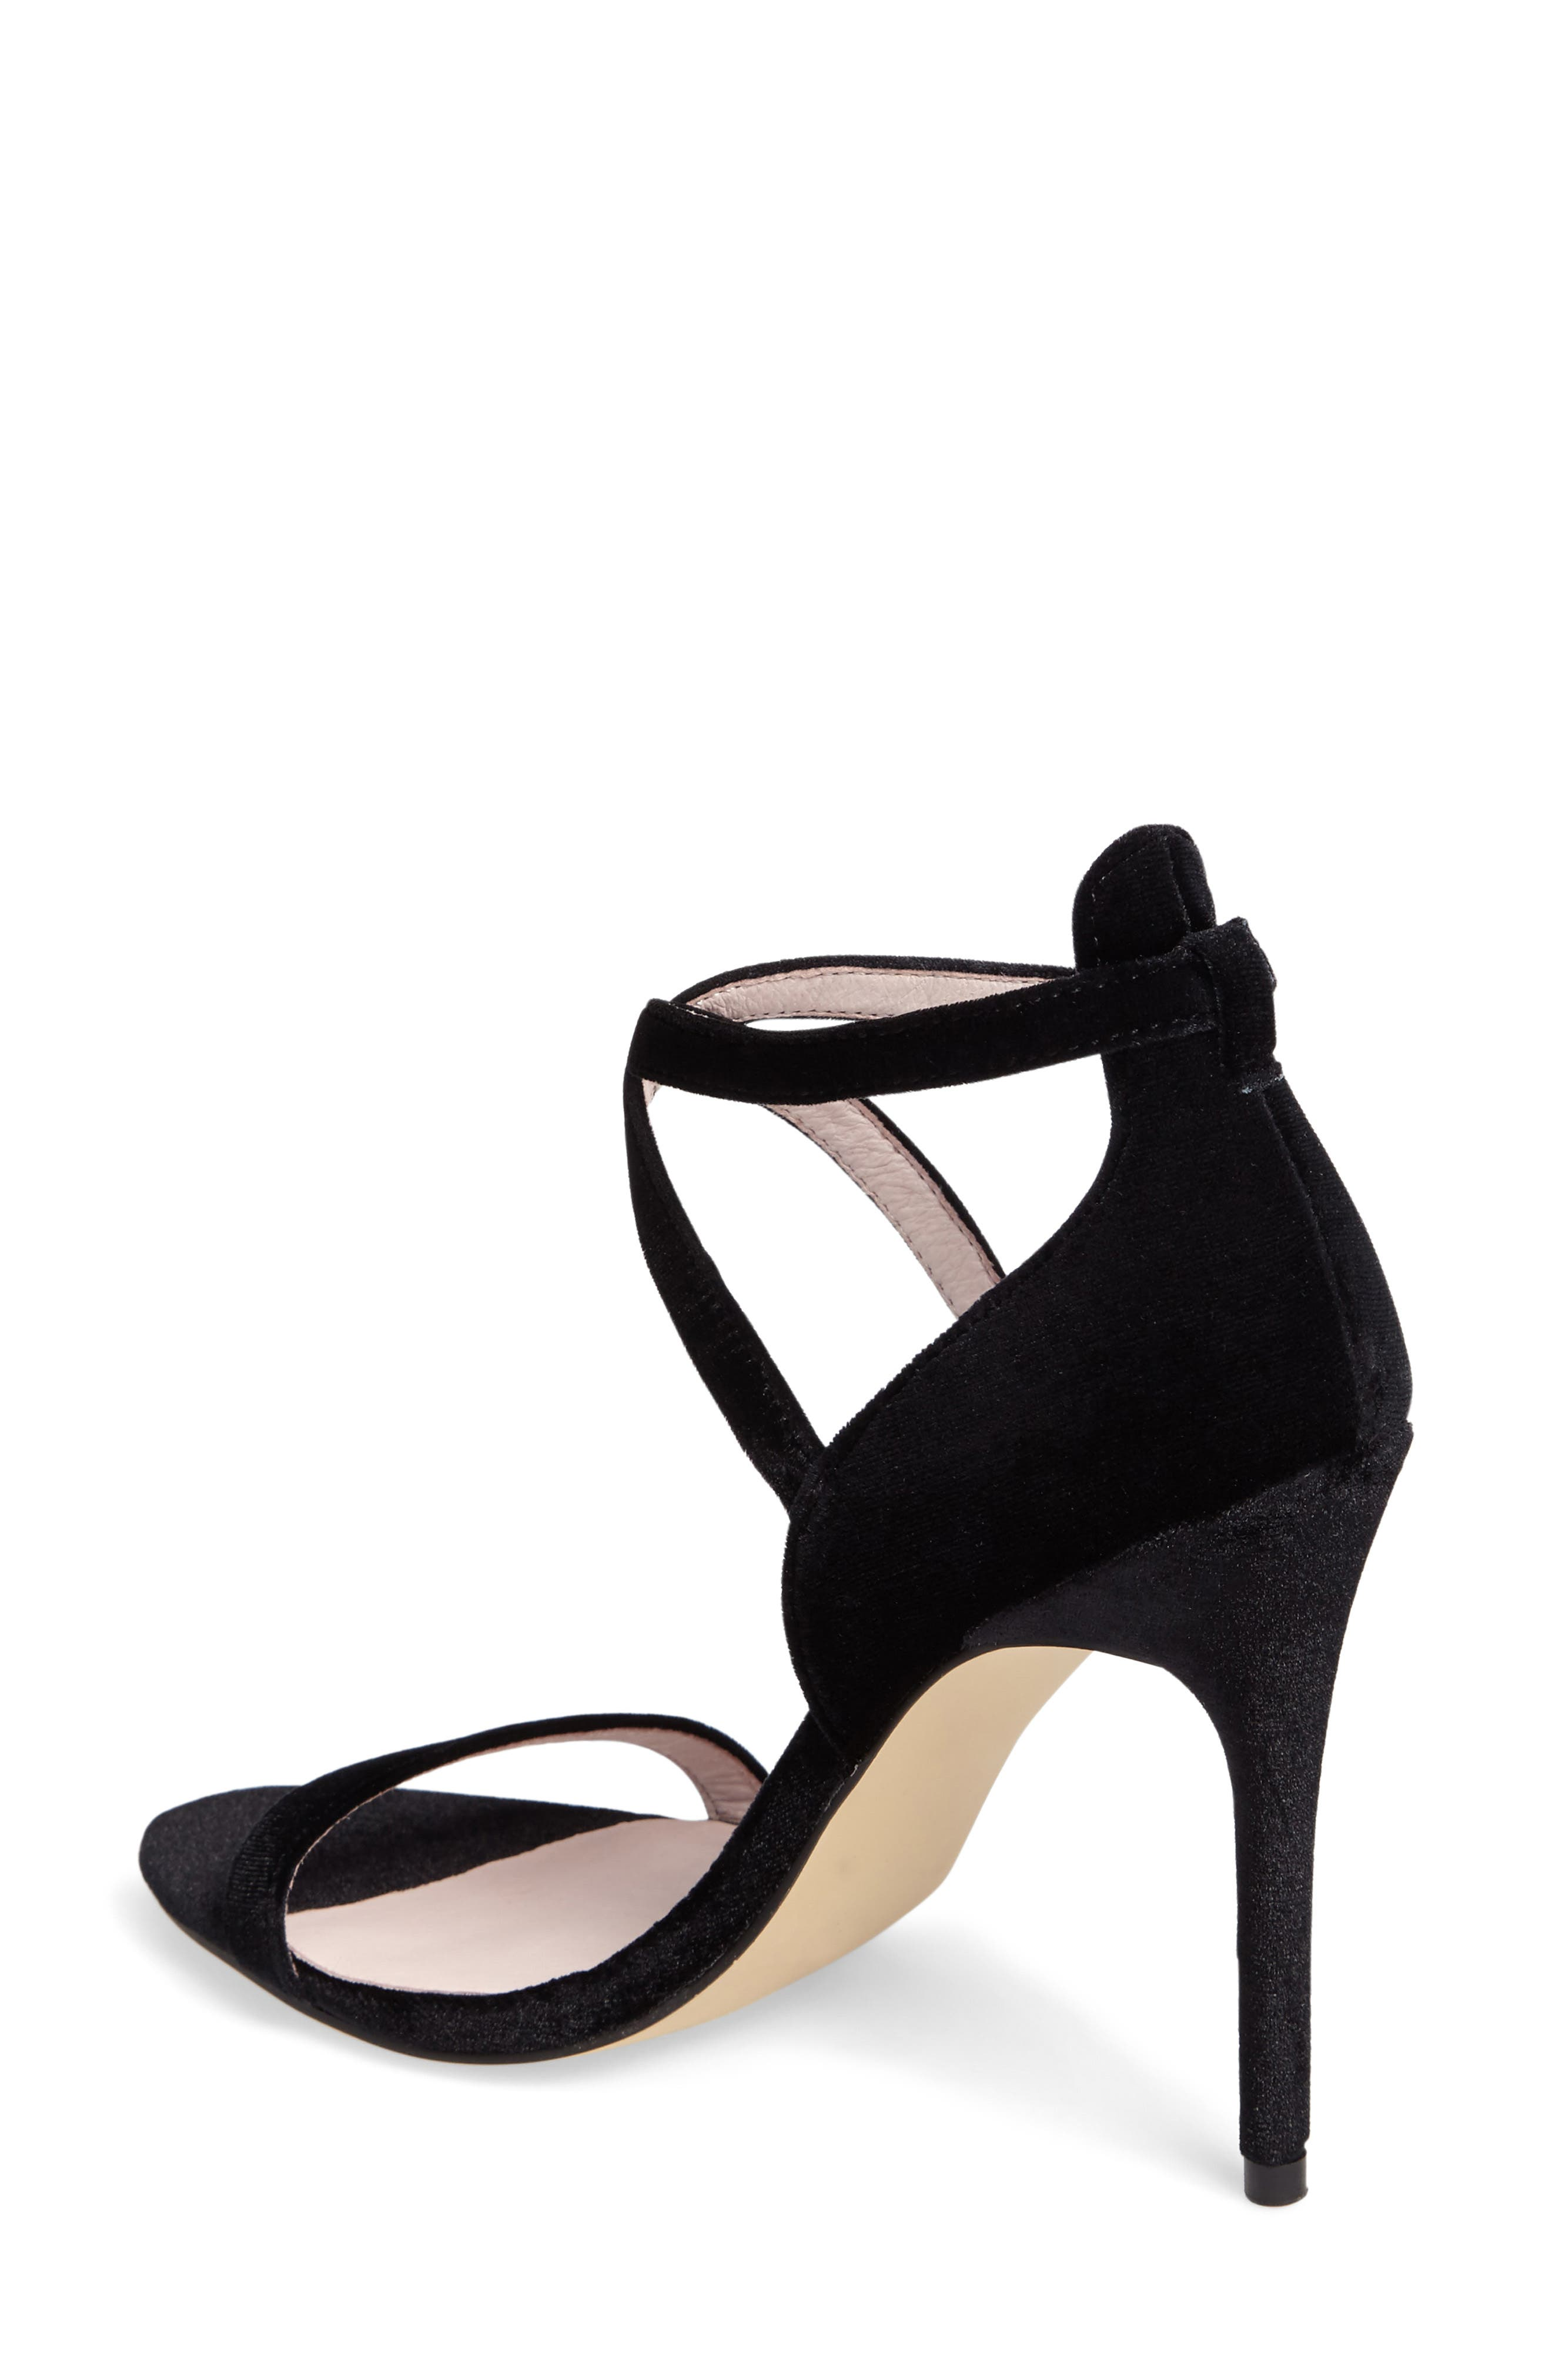 Lavelle Ankle Strap Sandal,                             Alternate thumbnail 3, color,                             001